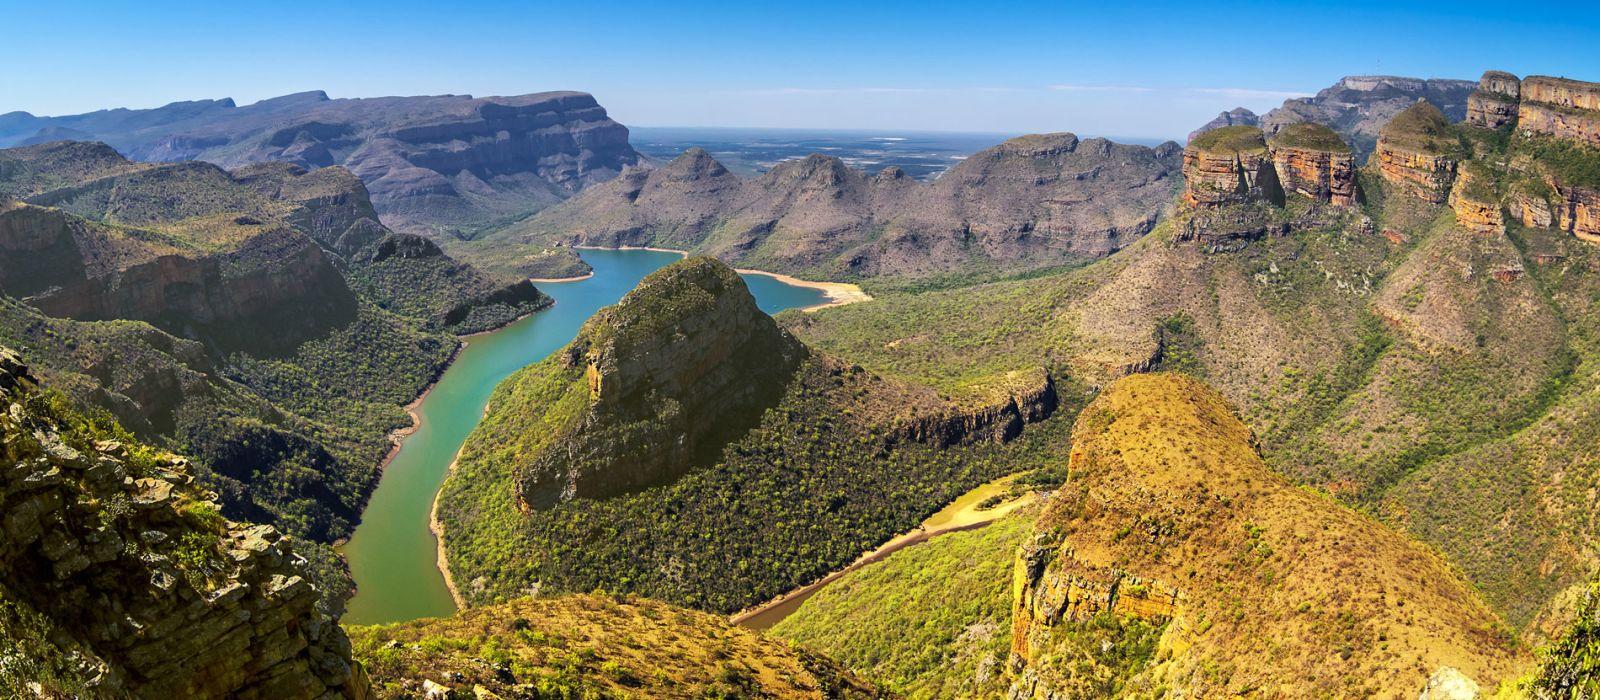 Rundreise Johannesburg nach Kapstadt – Südafrikas Höhepunkte Urlaub 1